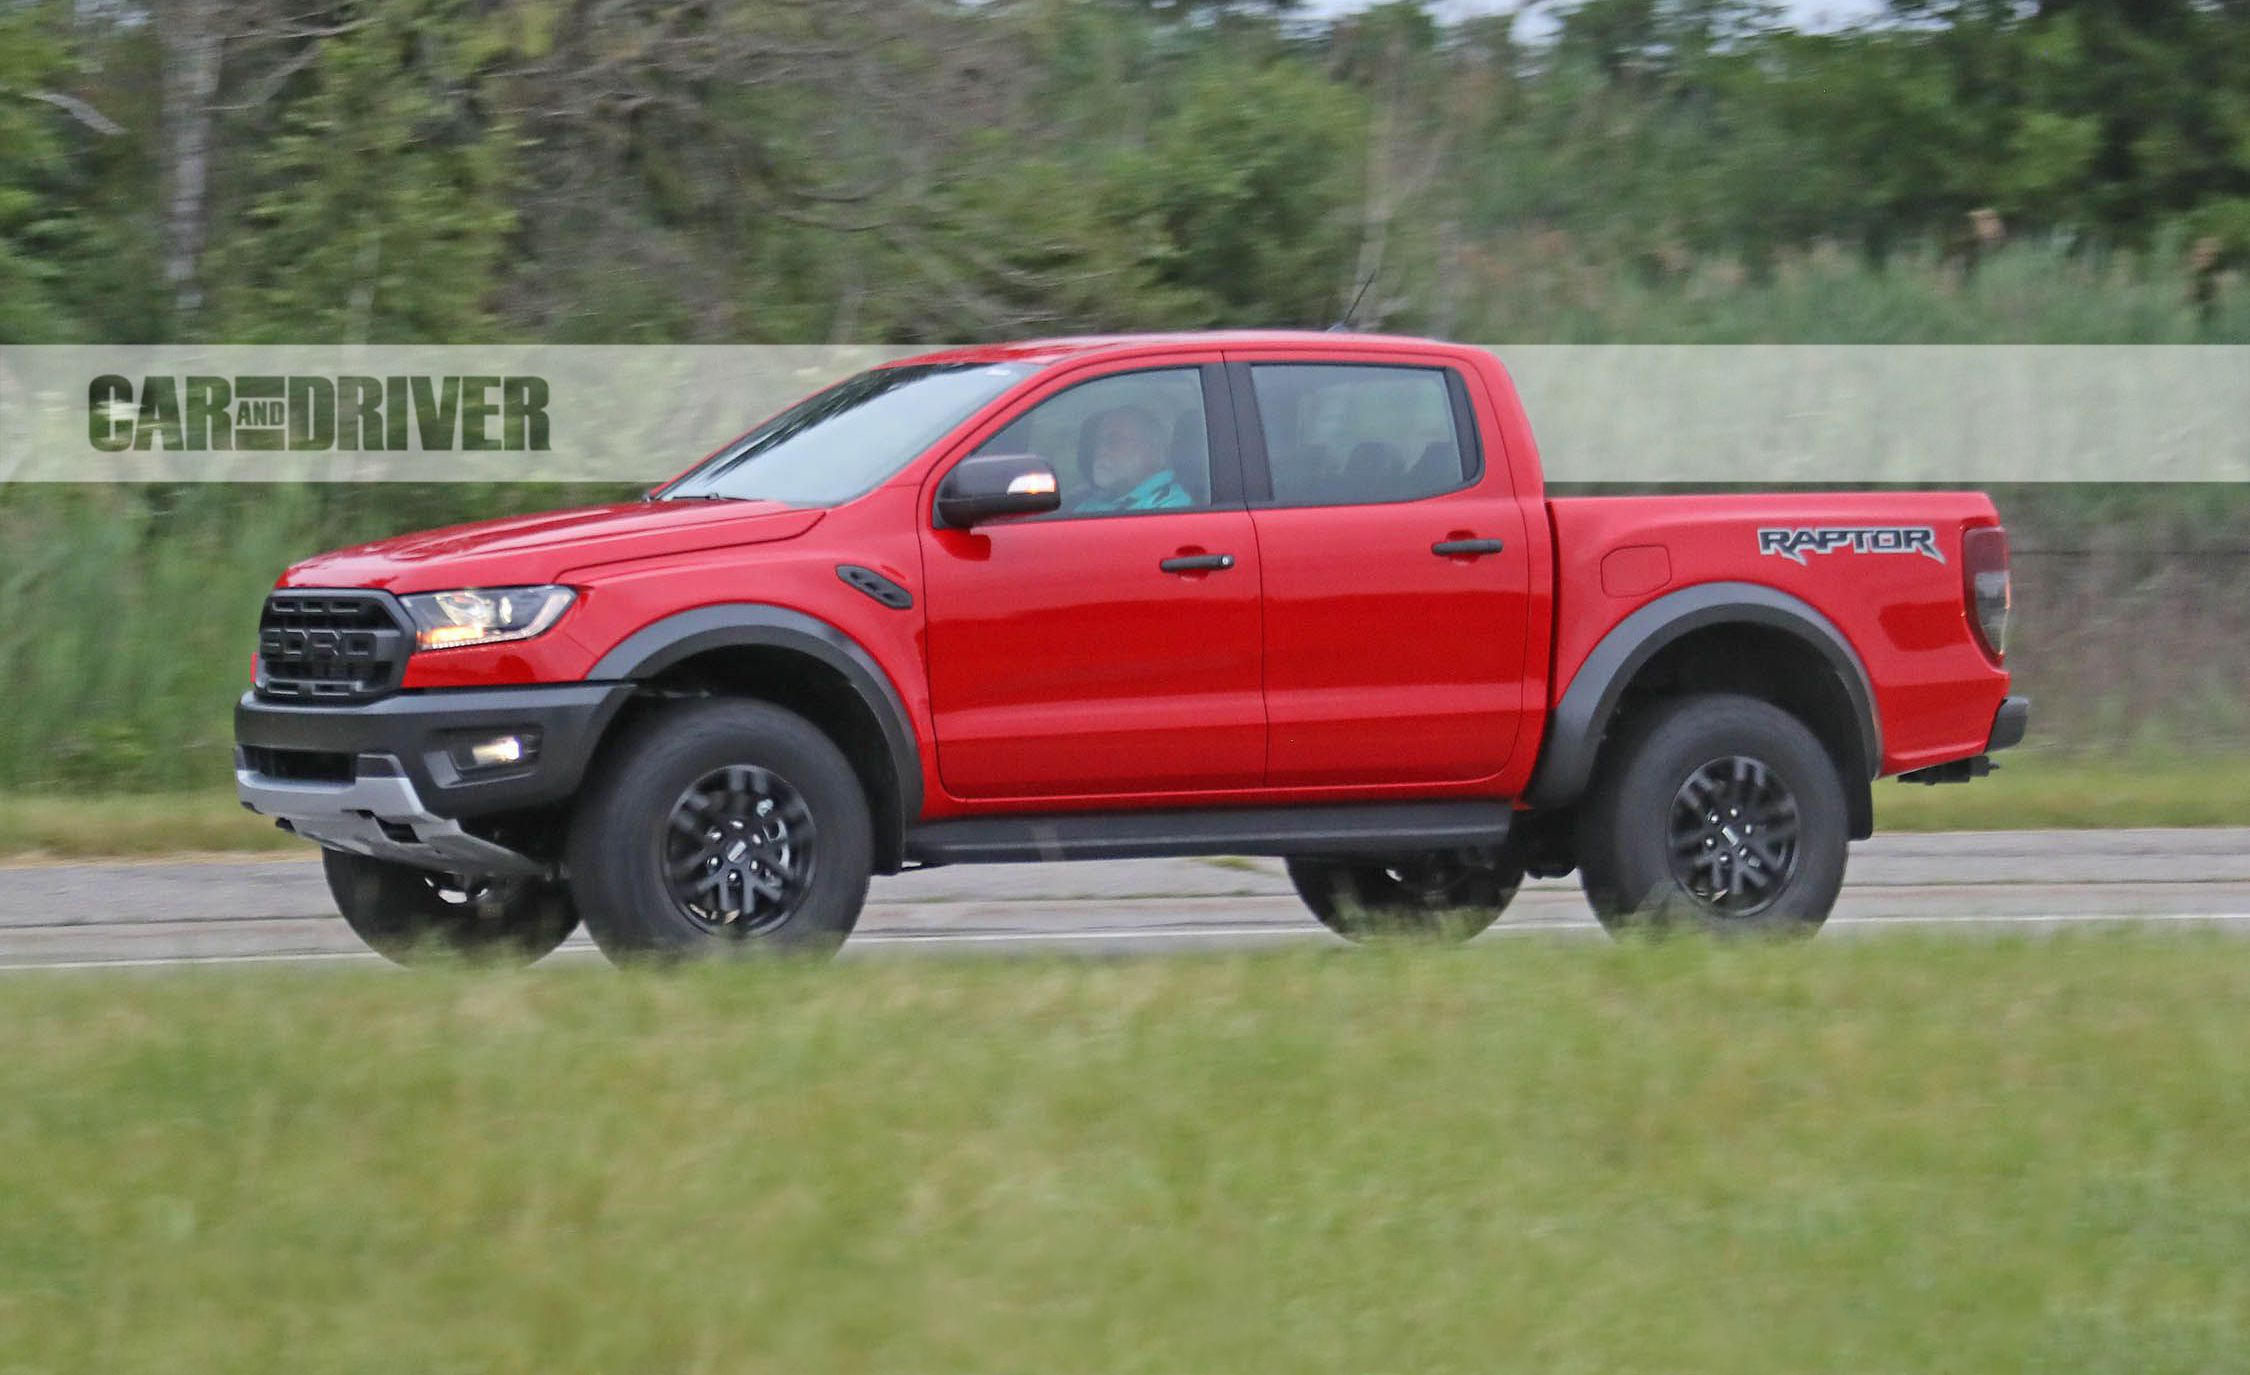 Ford Ranger 2019 >> 2021 Ford Ranger Raptor Spied | News | Car and Driver